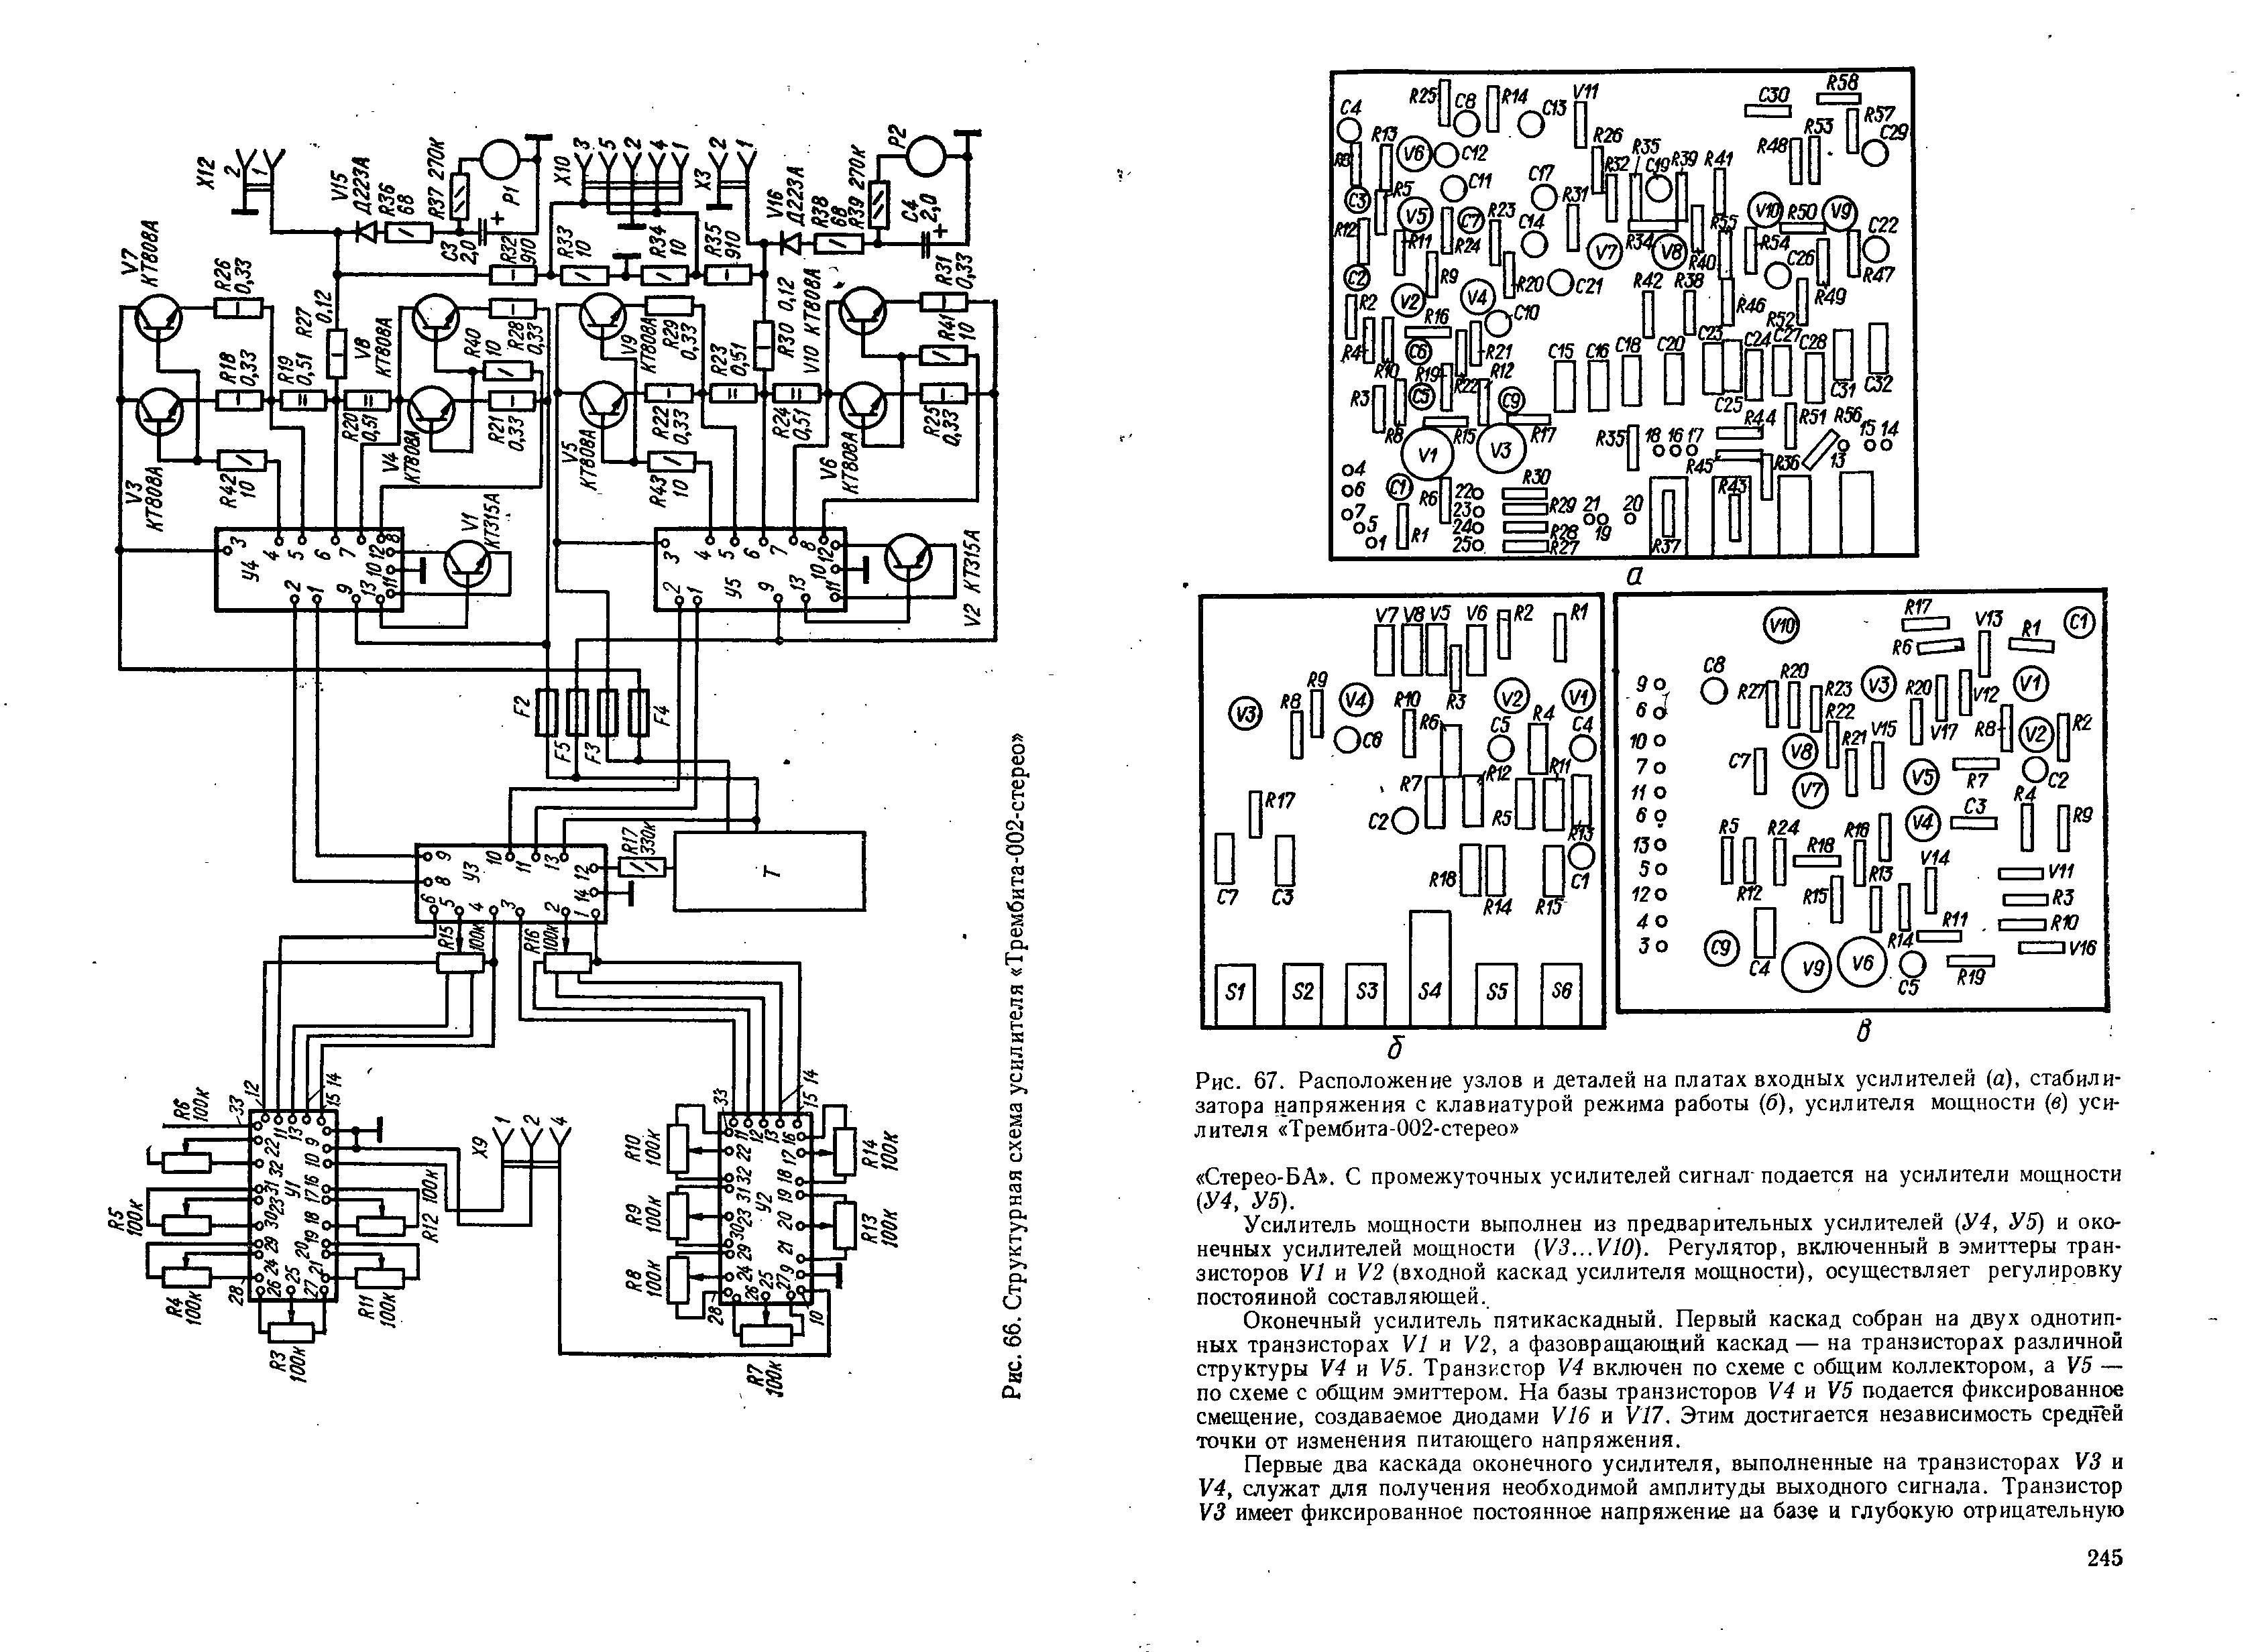 Орфей 201 схема.